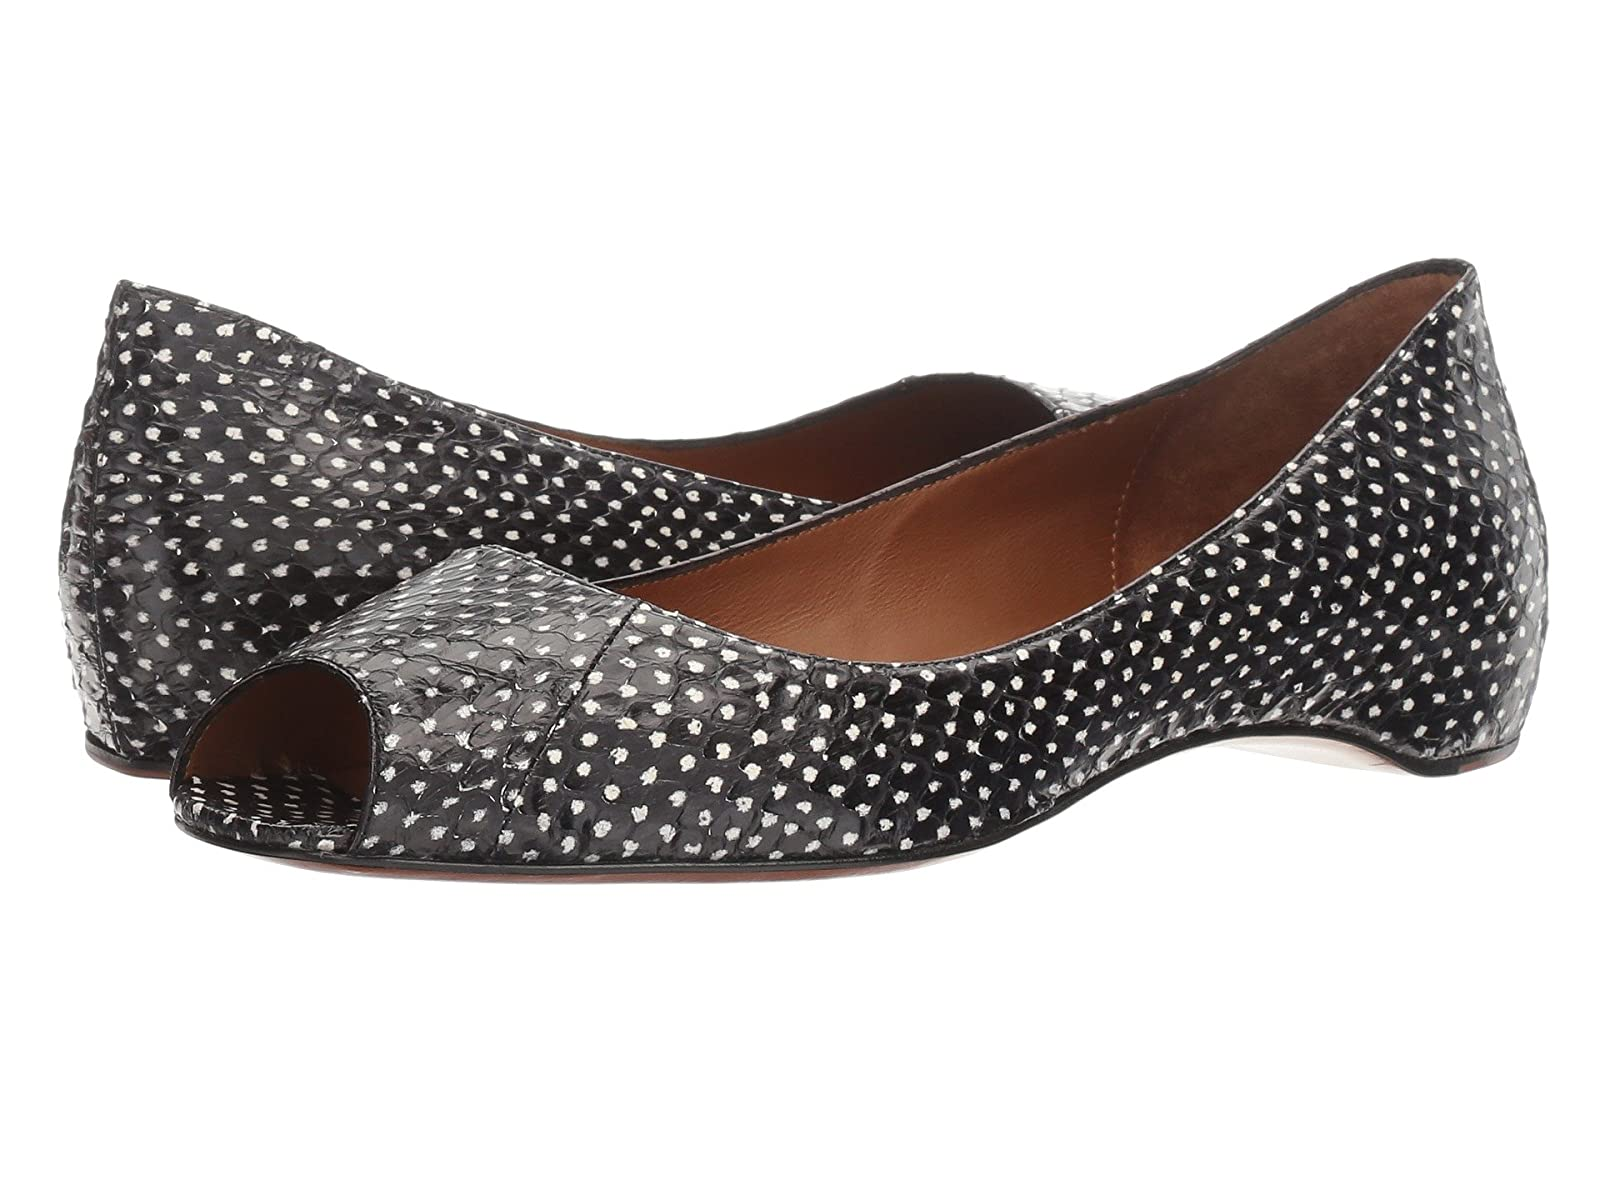 Aquatalia CamilleCheap and distinctive eye-catching shoes